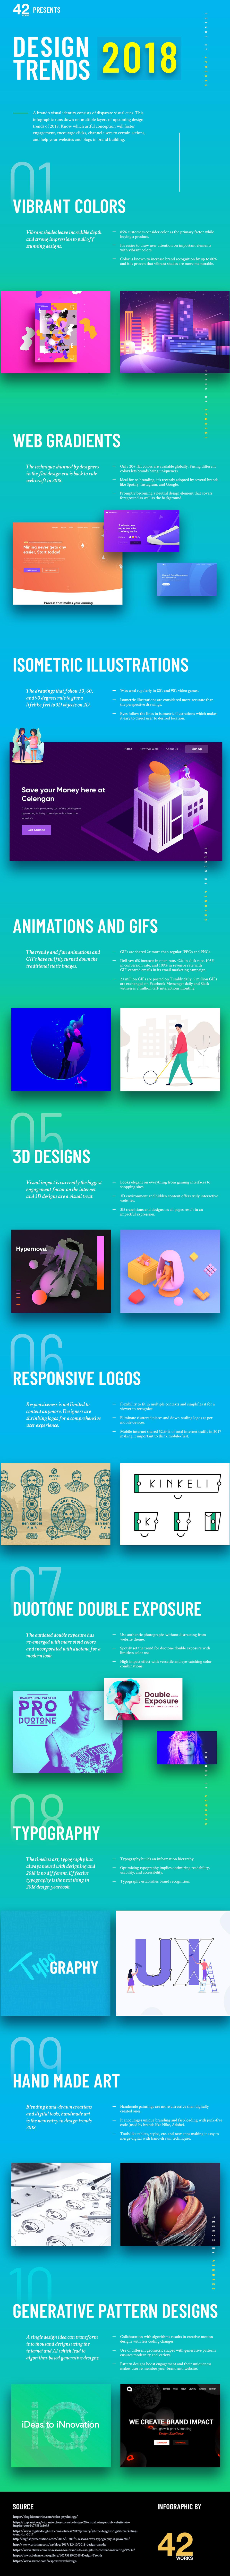 Design Trends 2019 on Behance